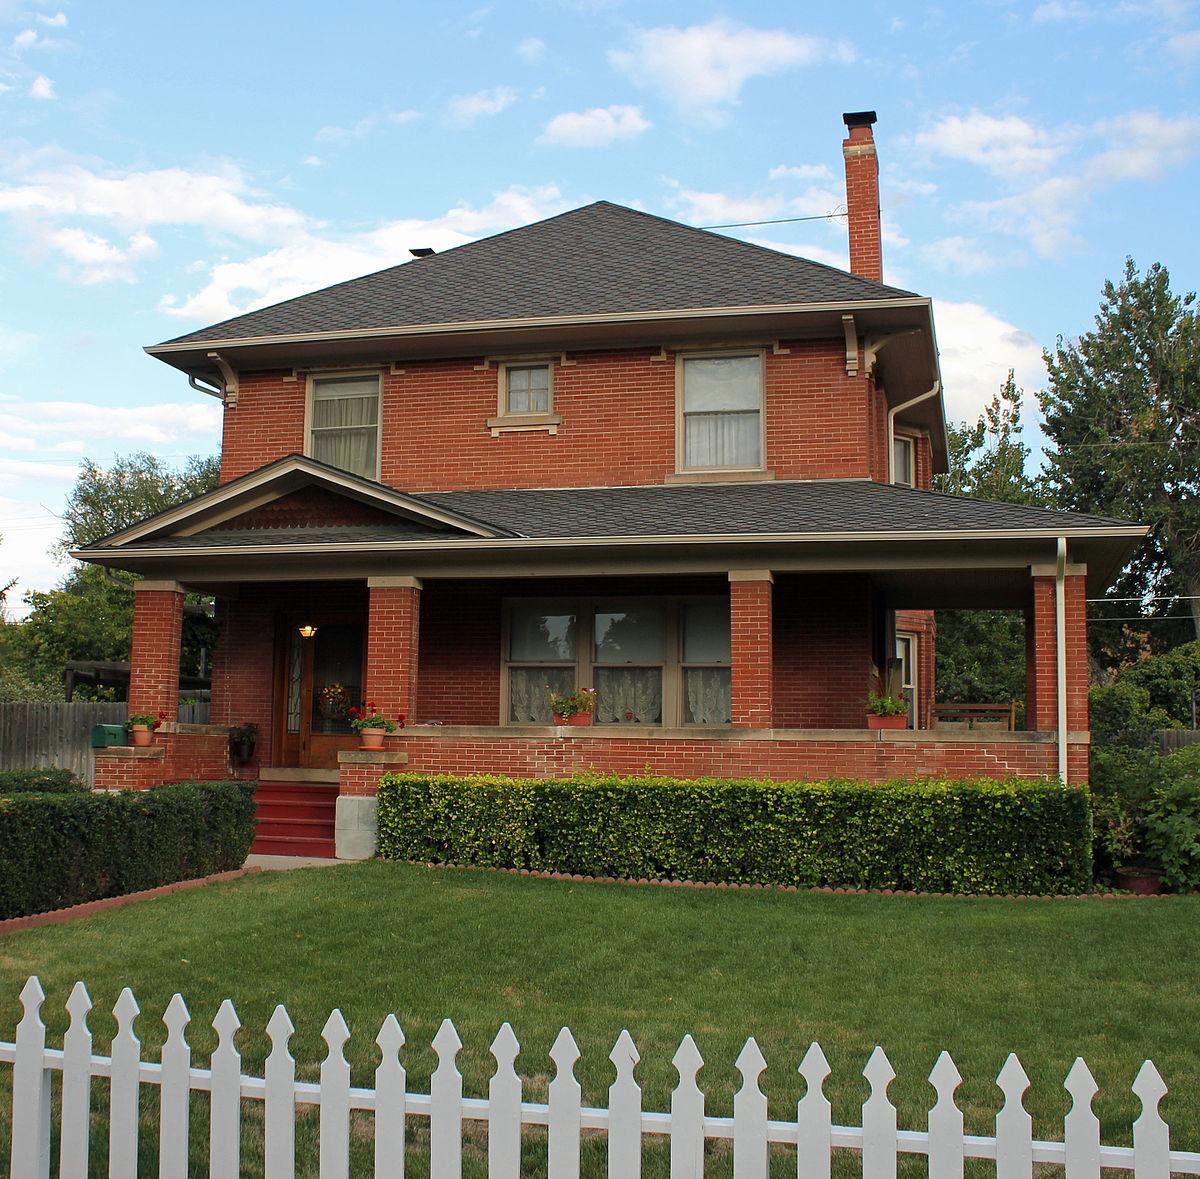 William smith house aurora colorado wikipedia for House aurora